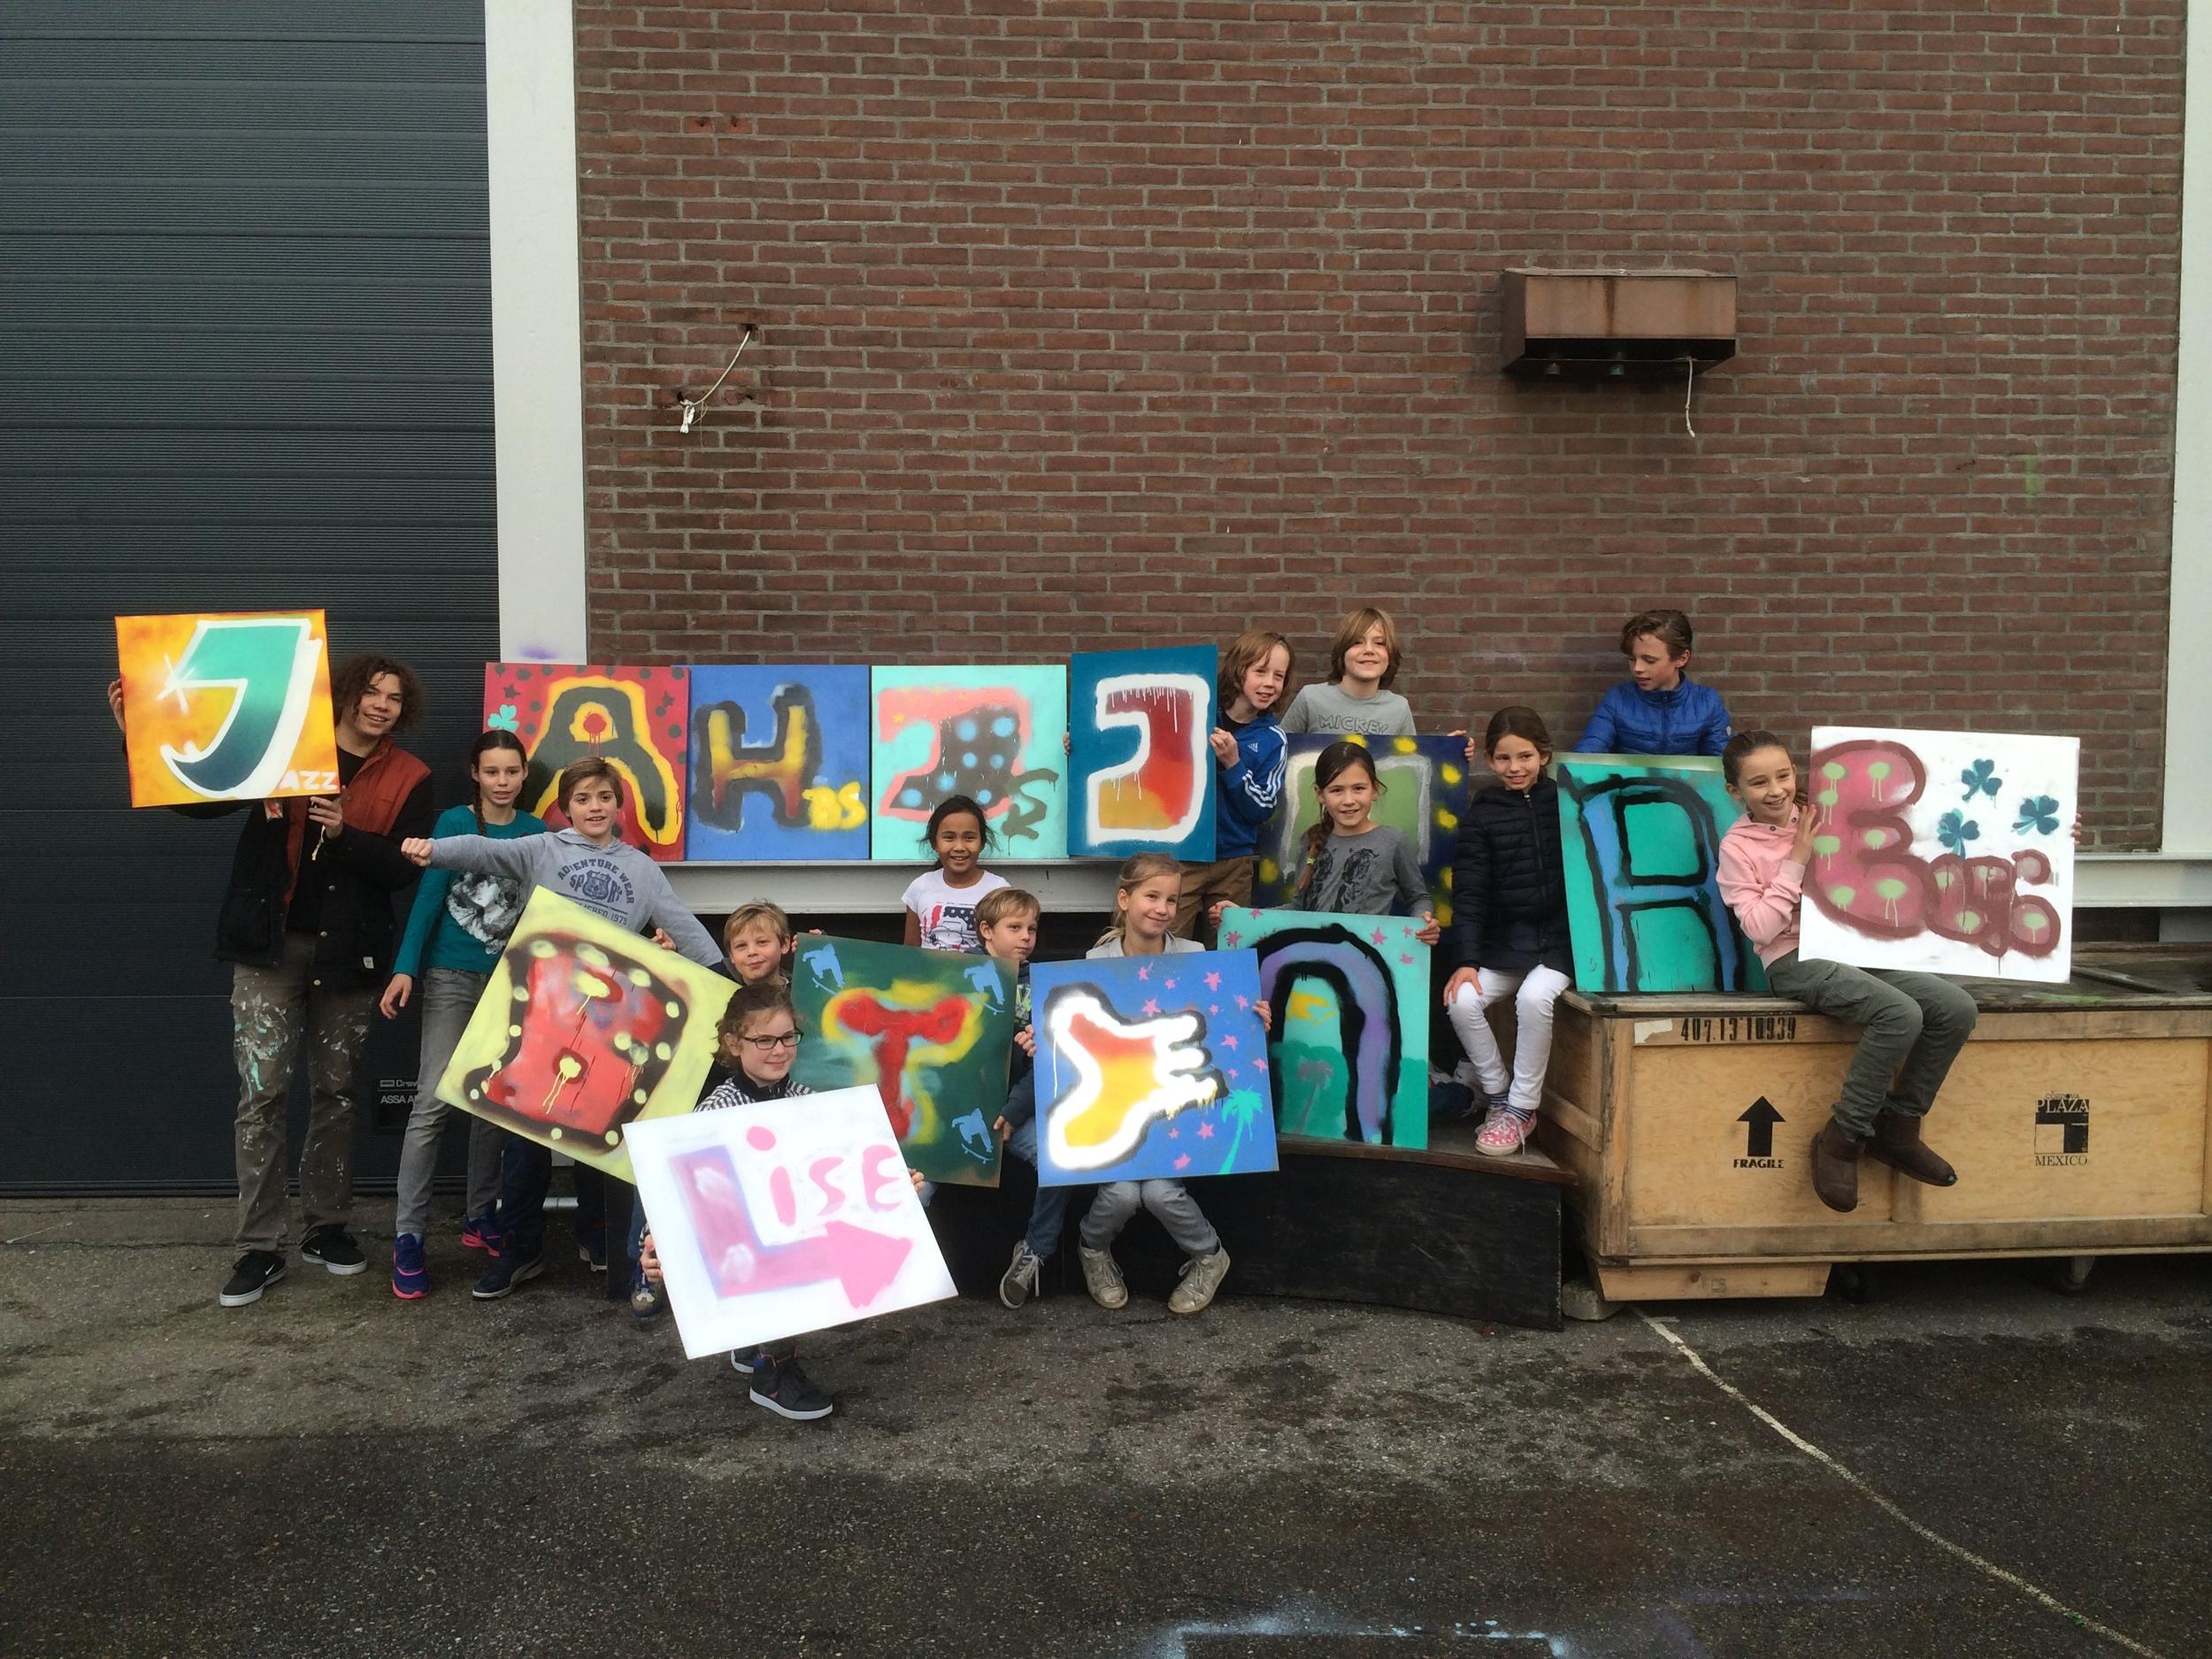 Graffiti feestje Sweatshop skatepark den Haag 2015.JPG